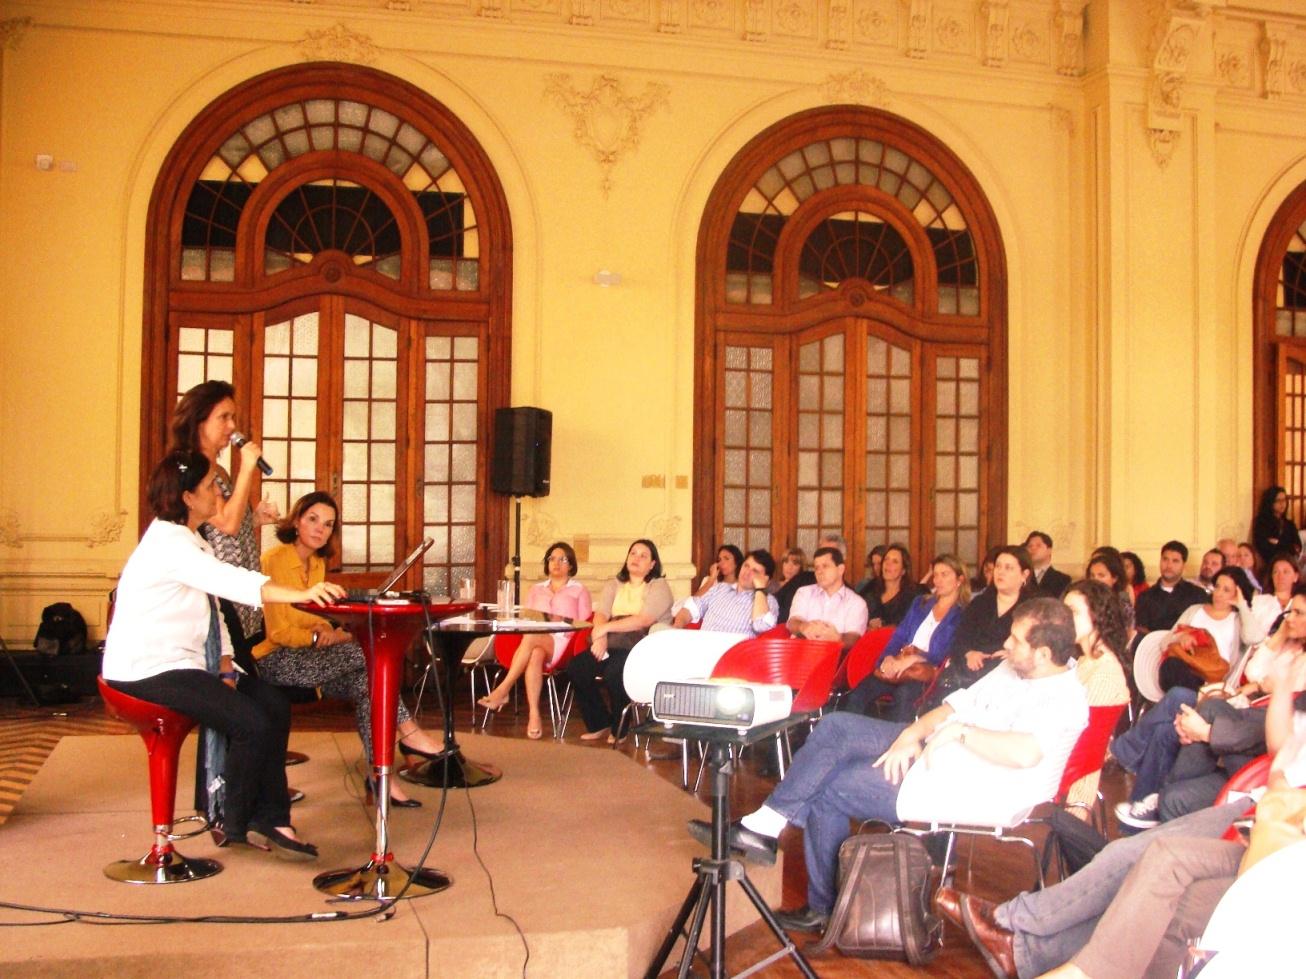 Evento marca o início das obras  da Casa Cor Rio 2012